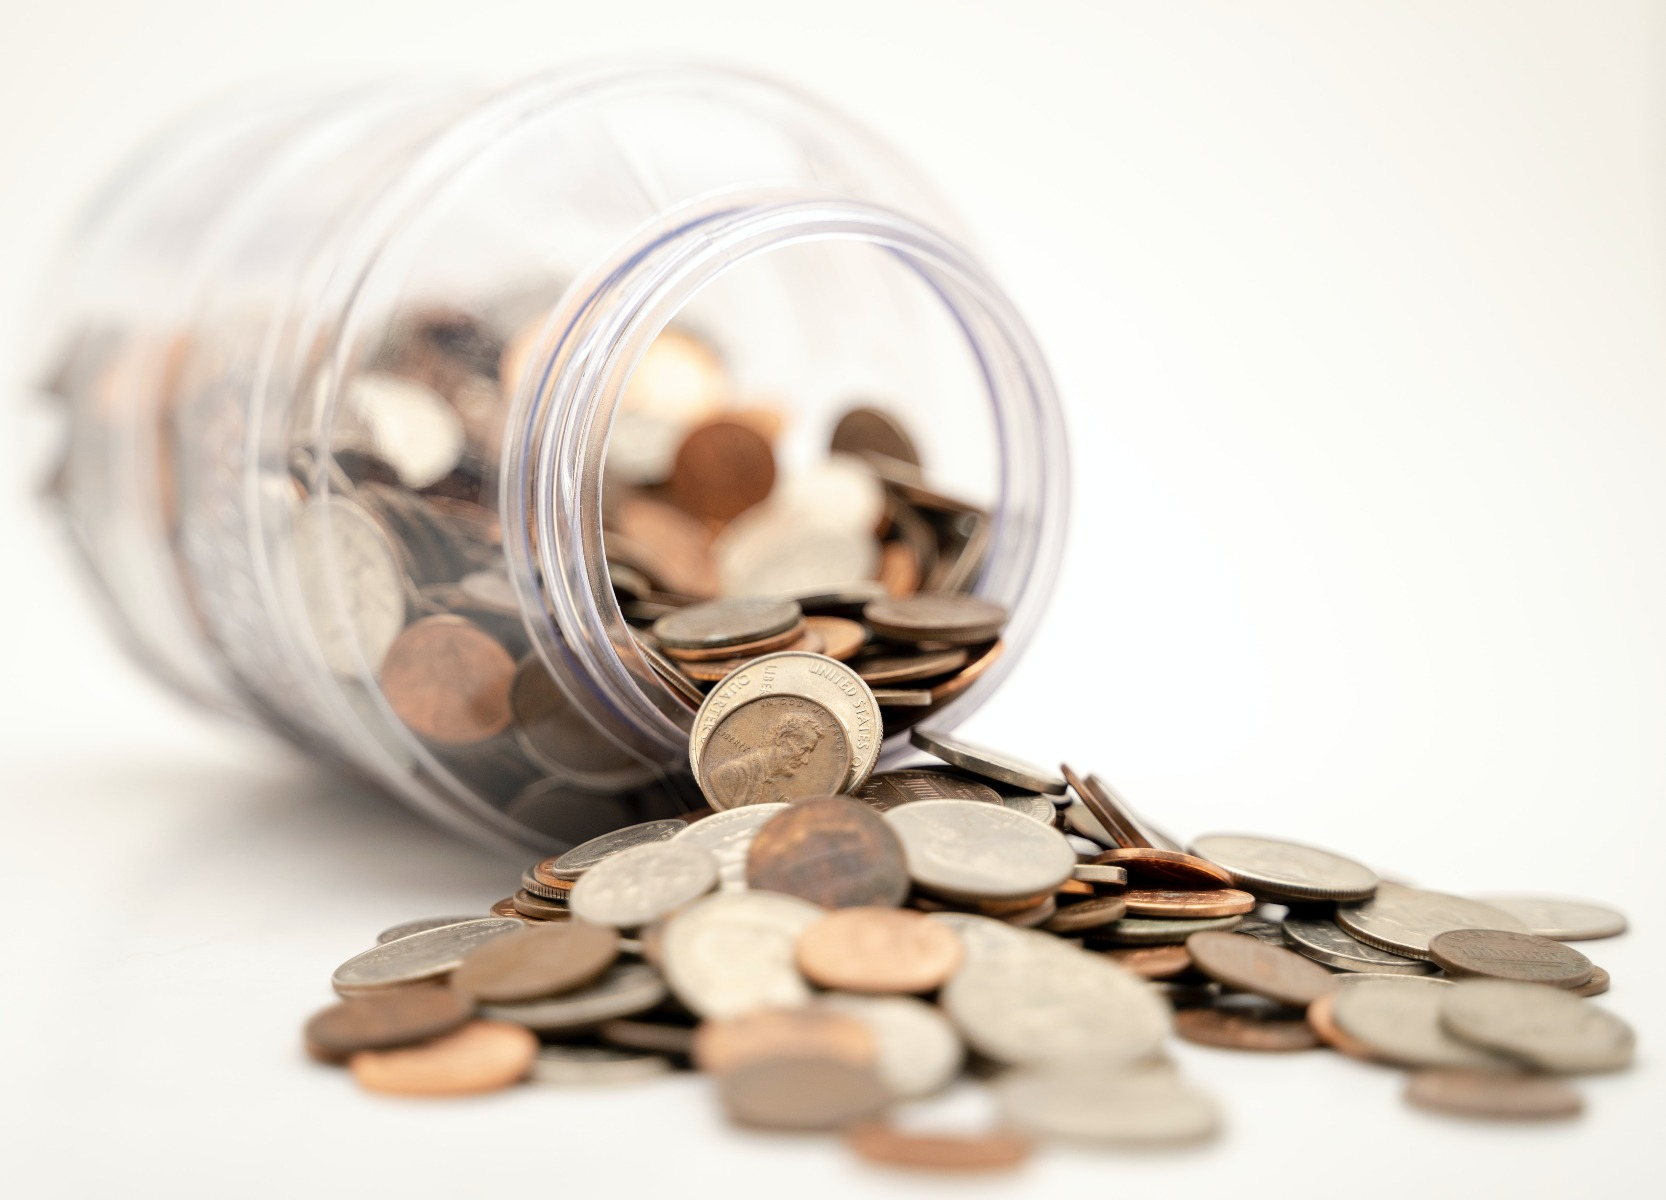 saving money at the top of bucket list